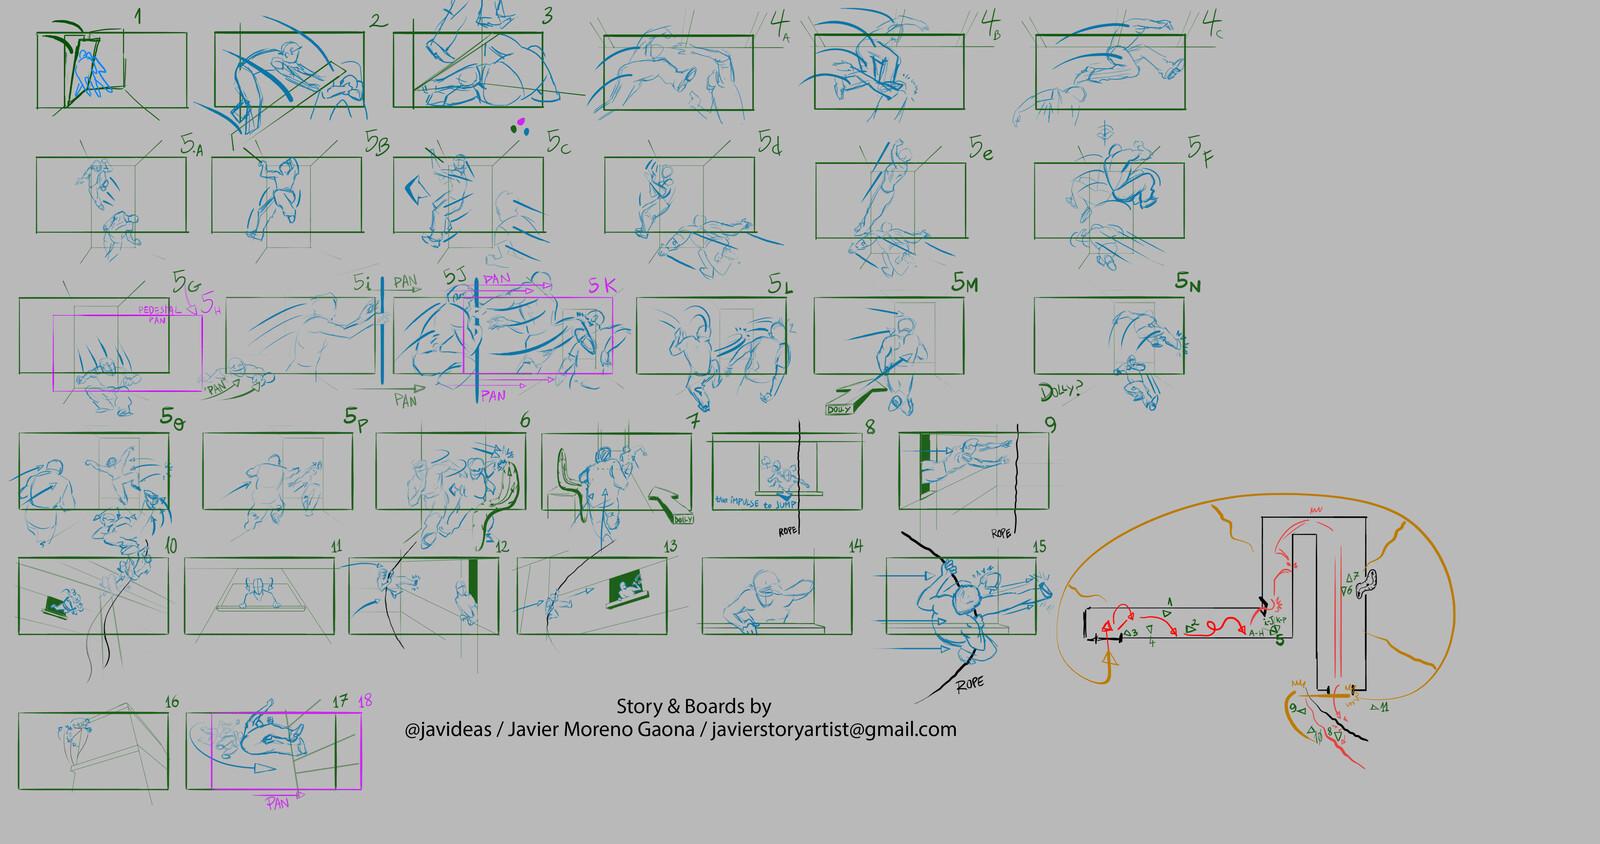 My original study on the Chase scene